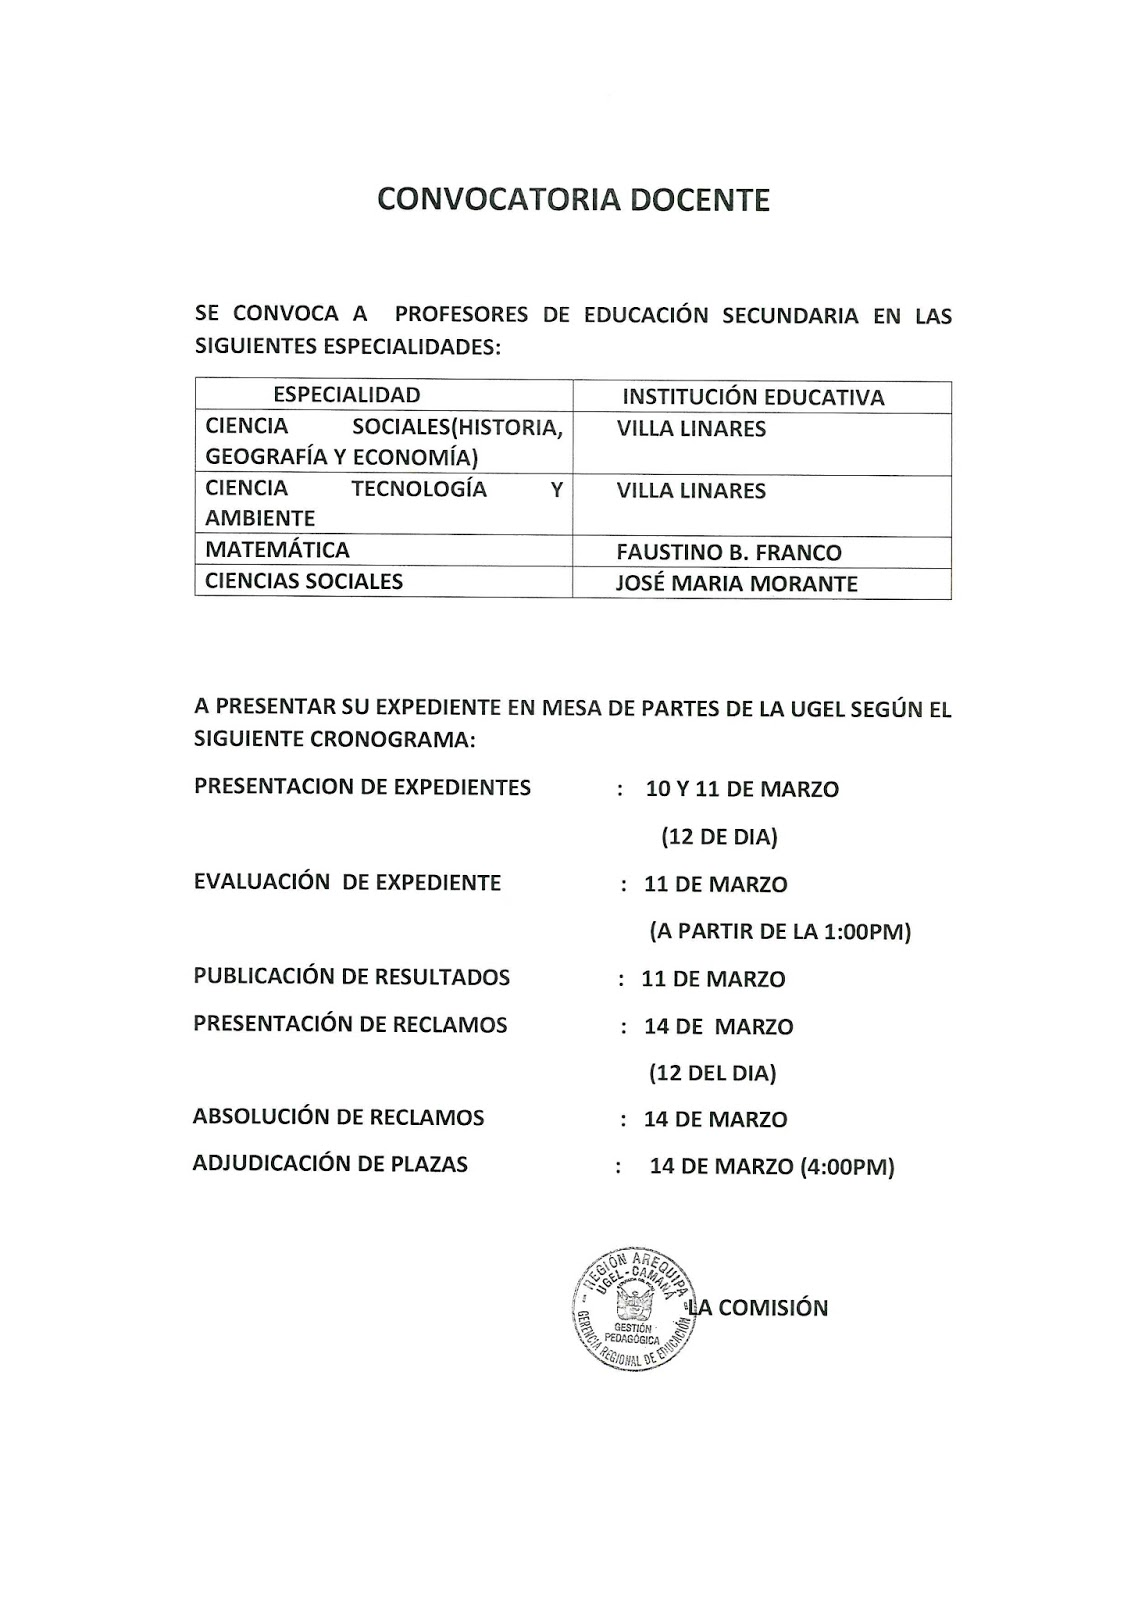 Contrato docente 2016 plazas vacantes de ciencias for Convocatoria para las plazas docentes 2016